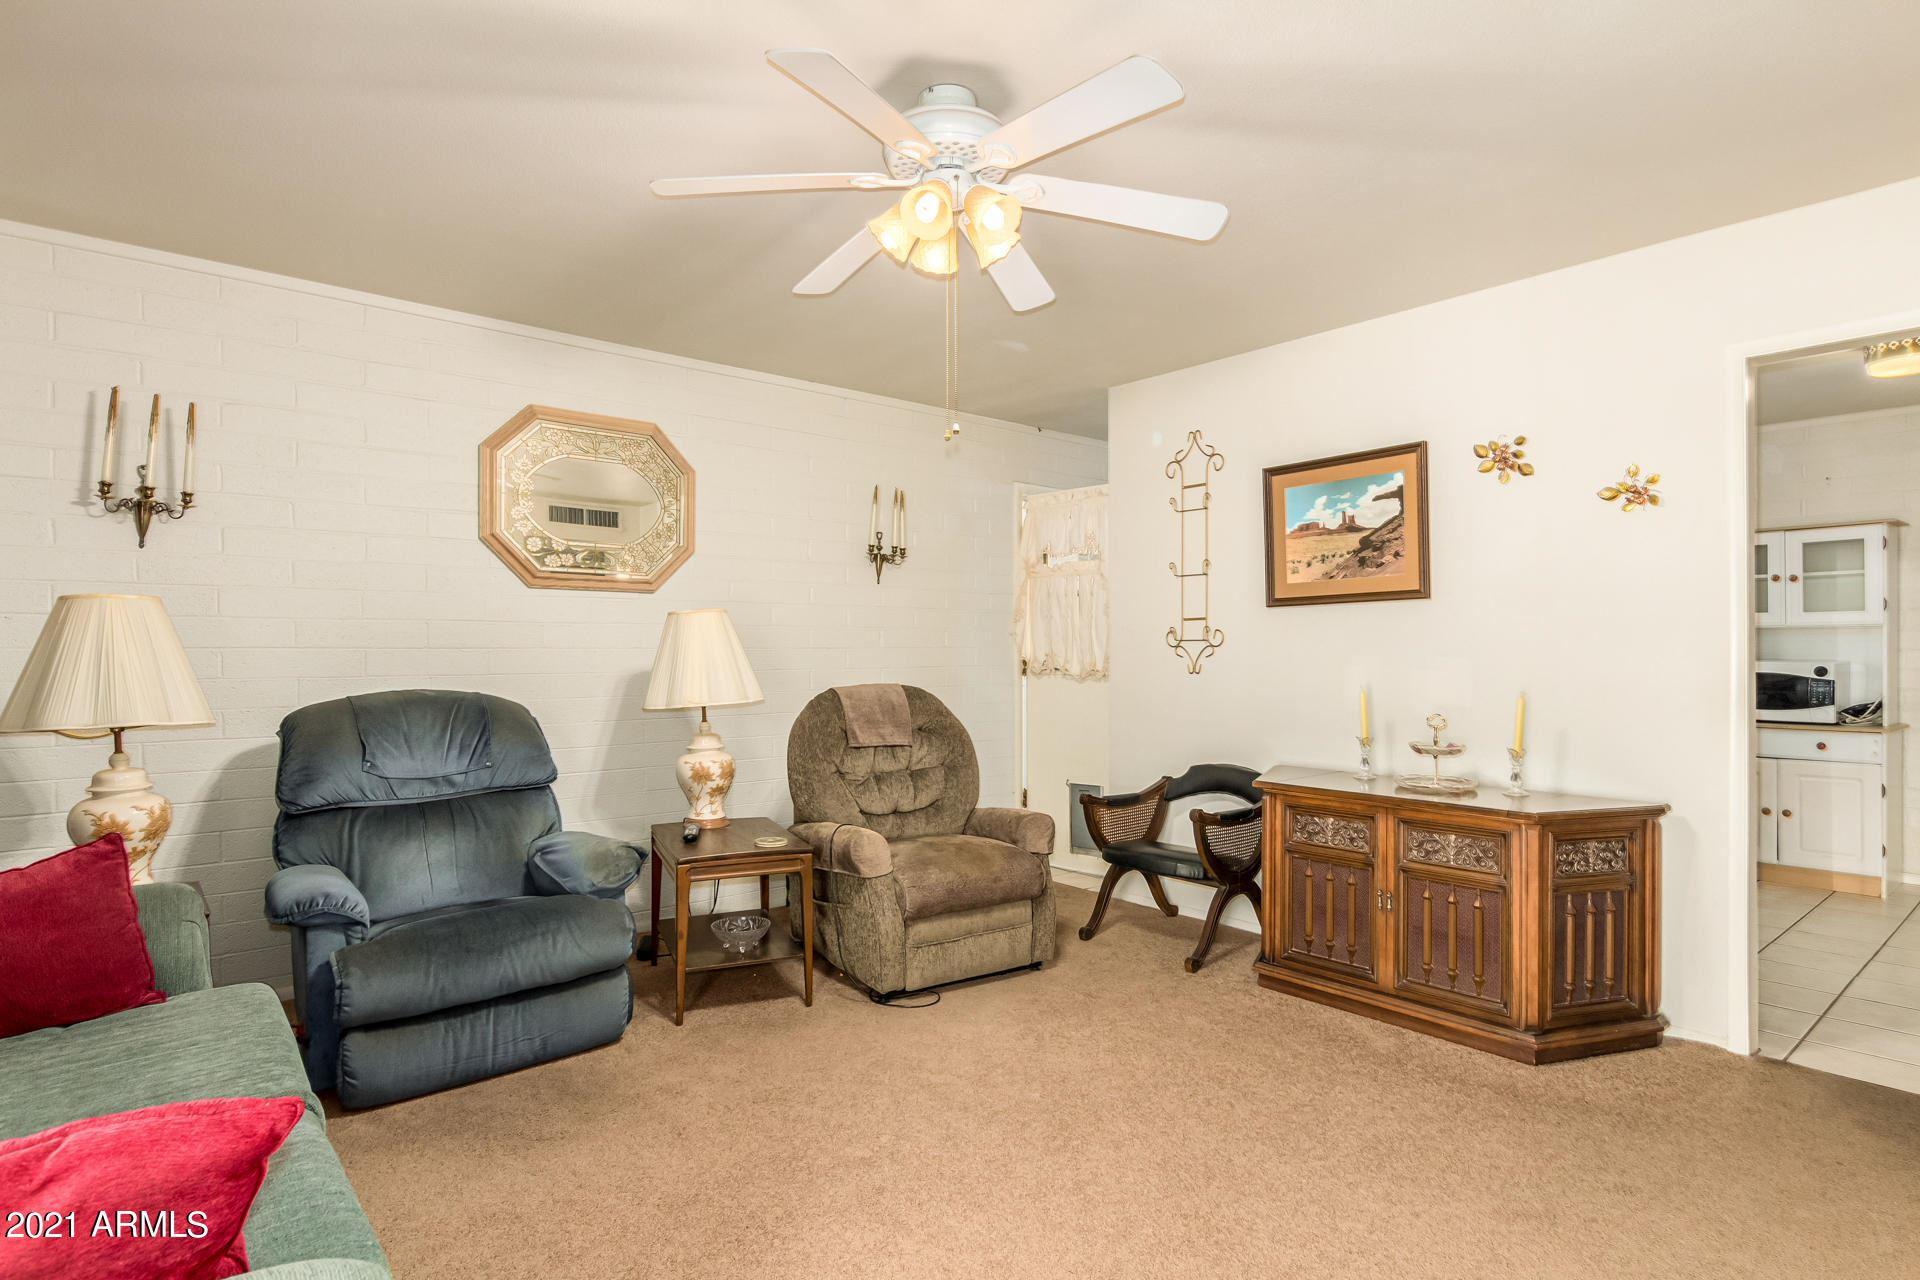 Photo of 10941 W CHERRY HILLS Drive, Sun City, AZ 85351 (MLS # 6249429)